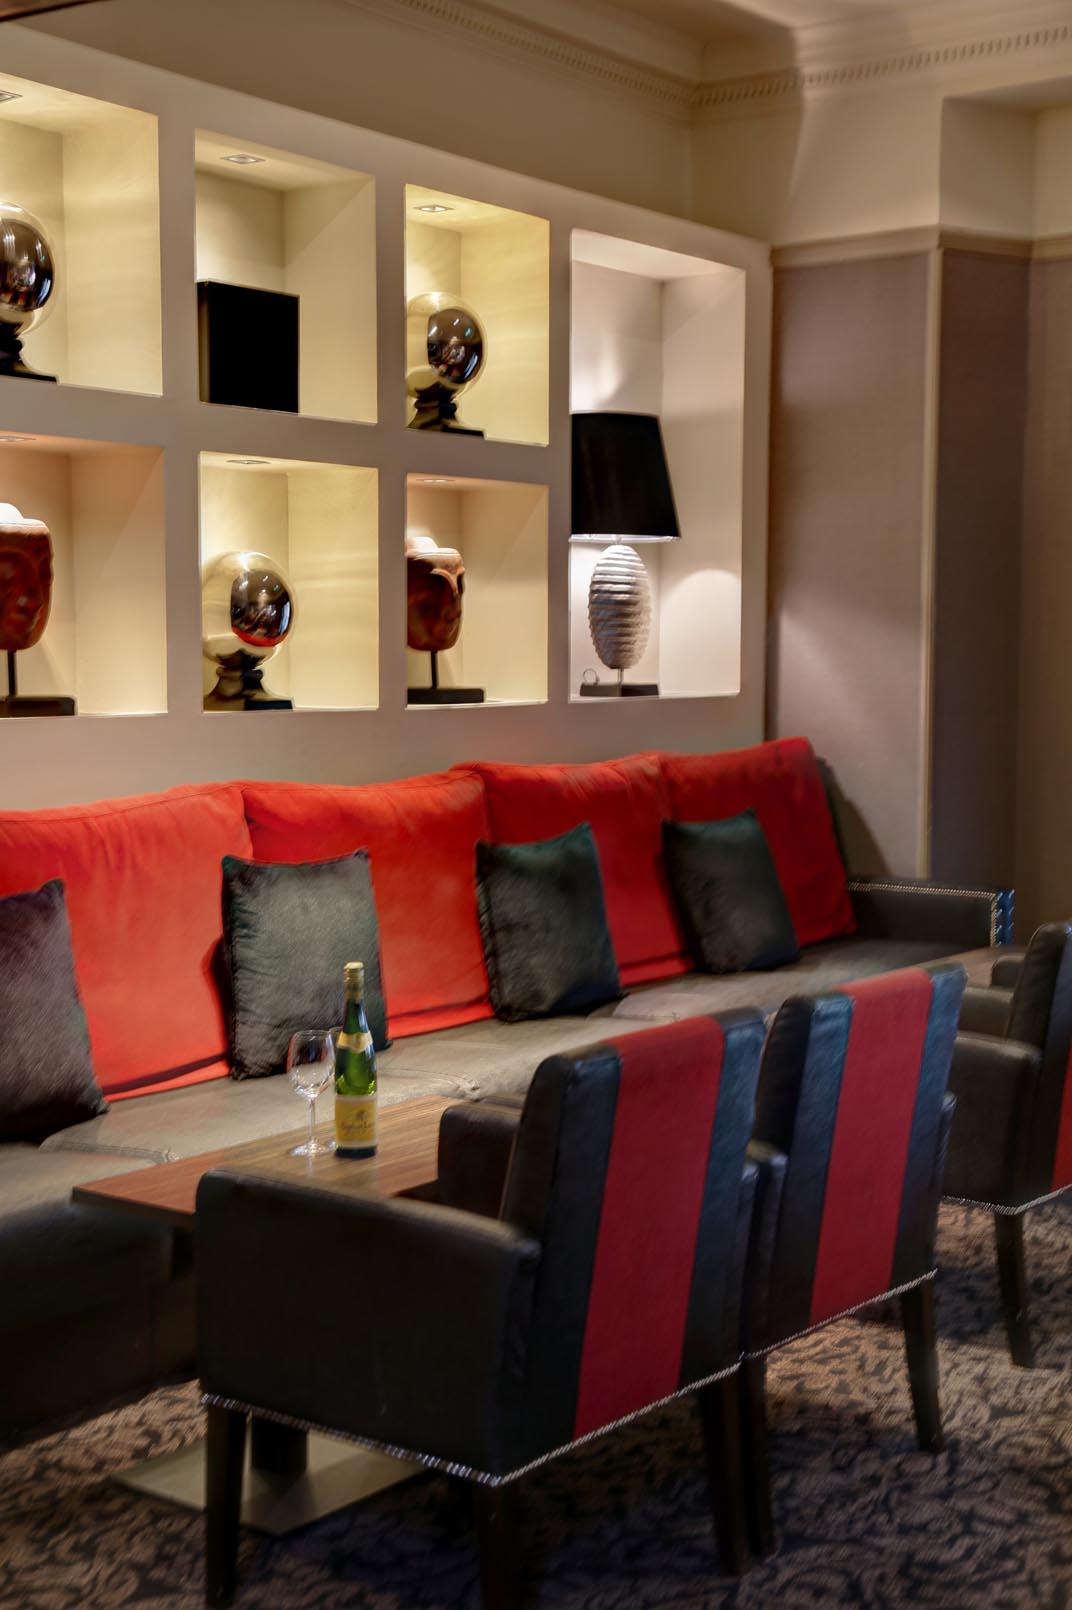 Best Western Hotel Room: Best Western Garfield House Hotel